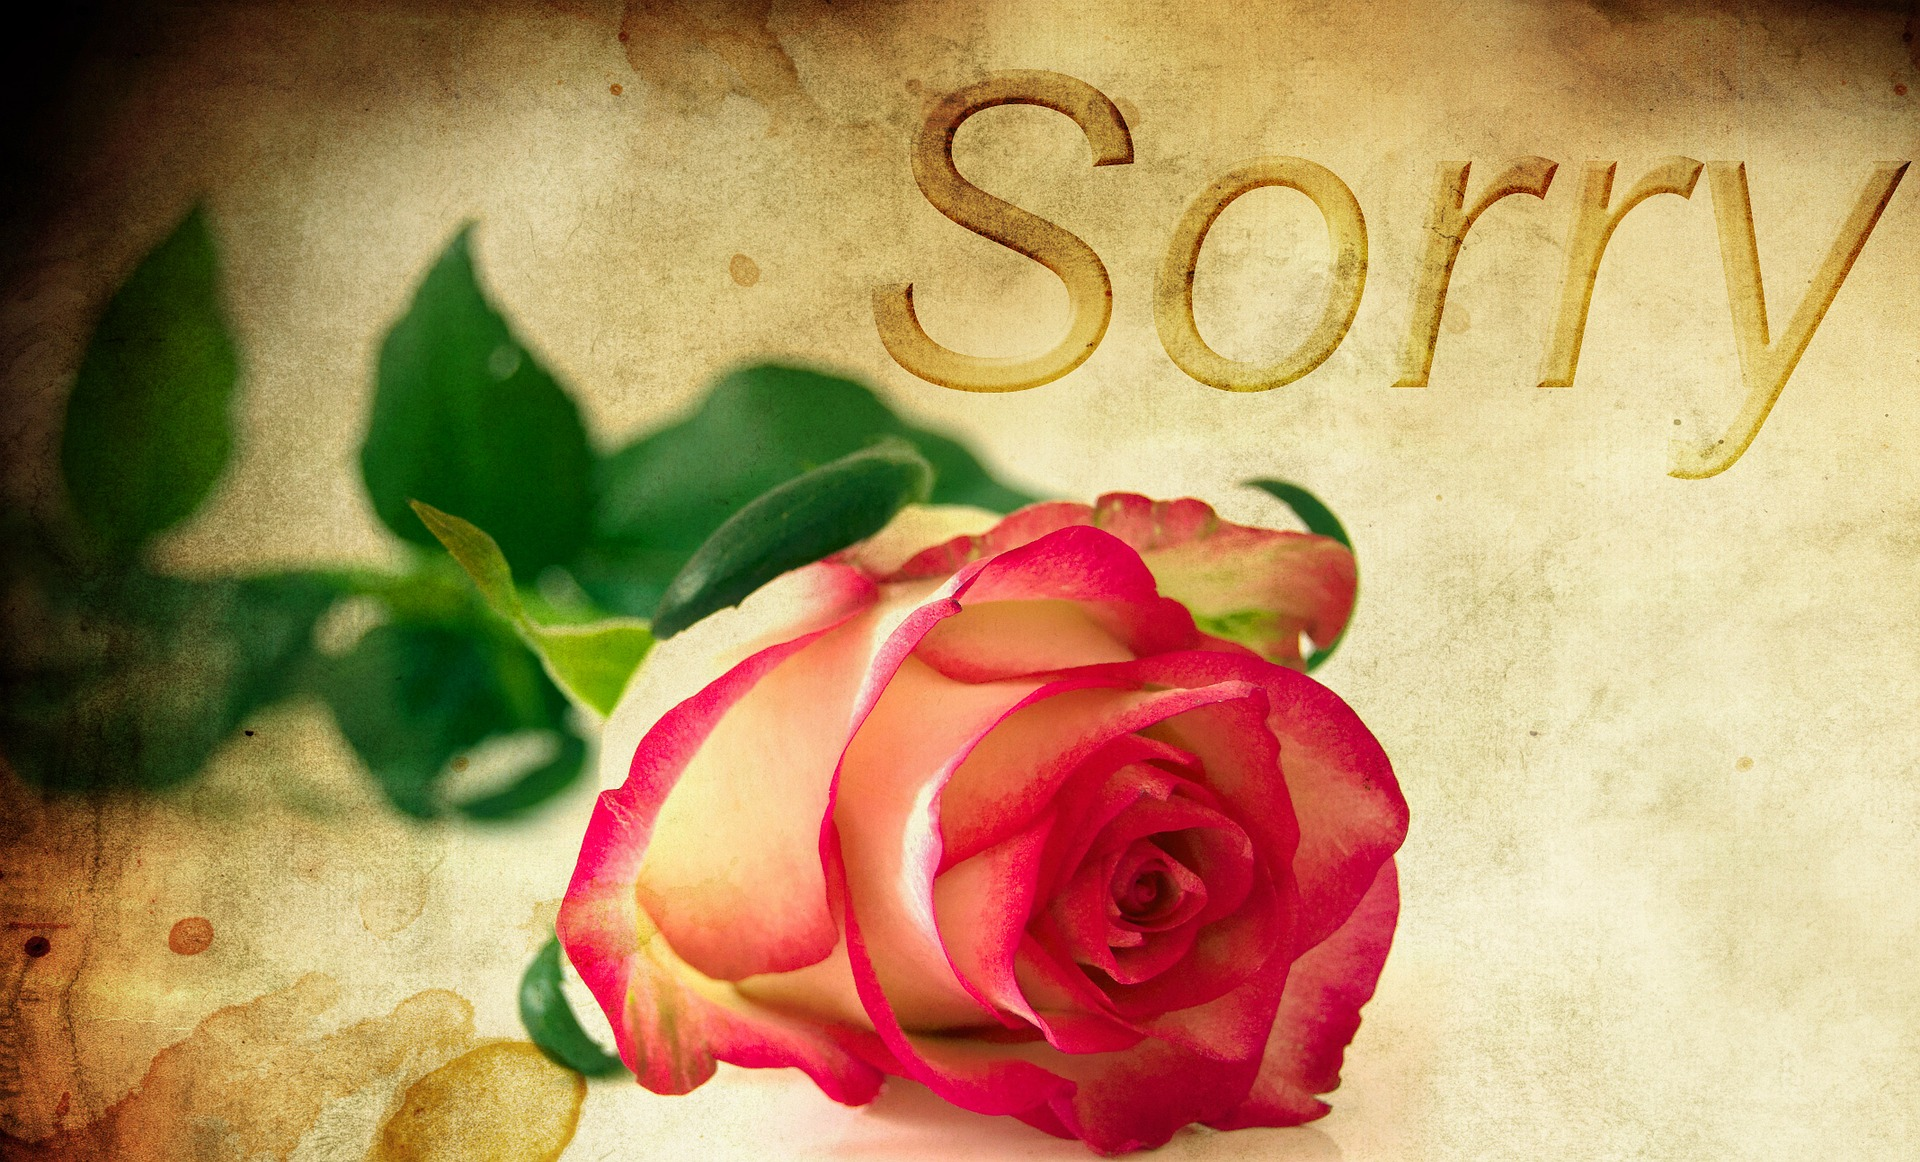 rose-1271216_1920.jpg